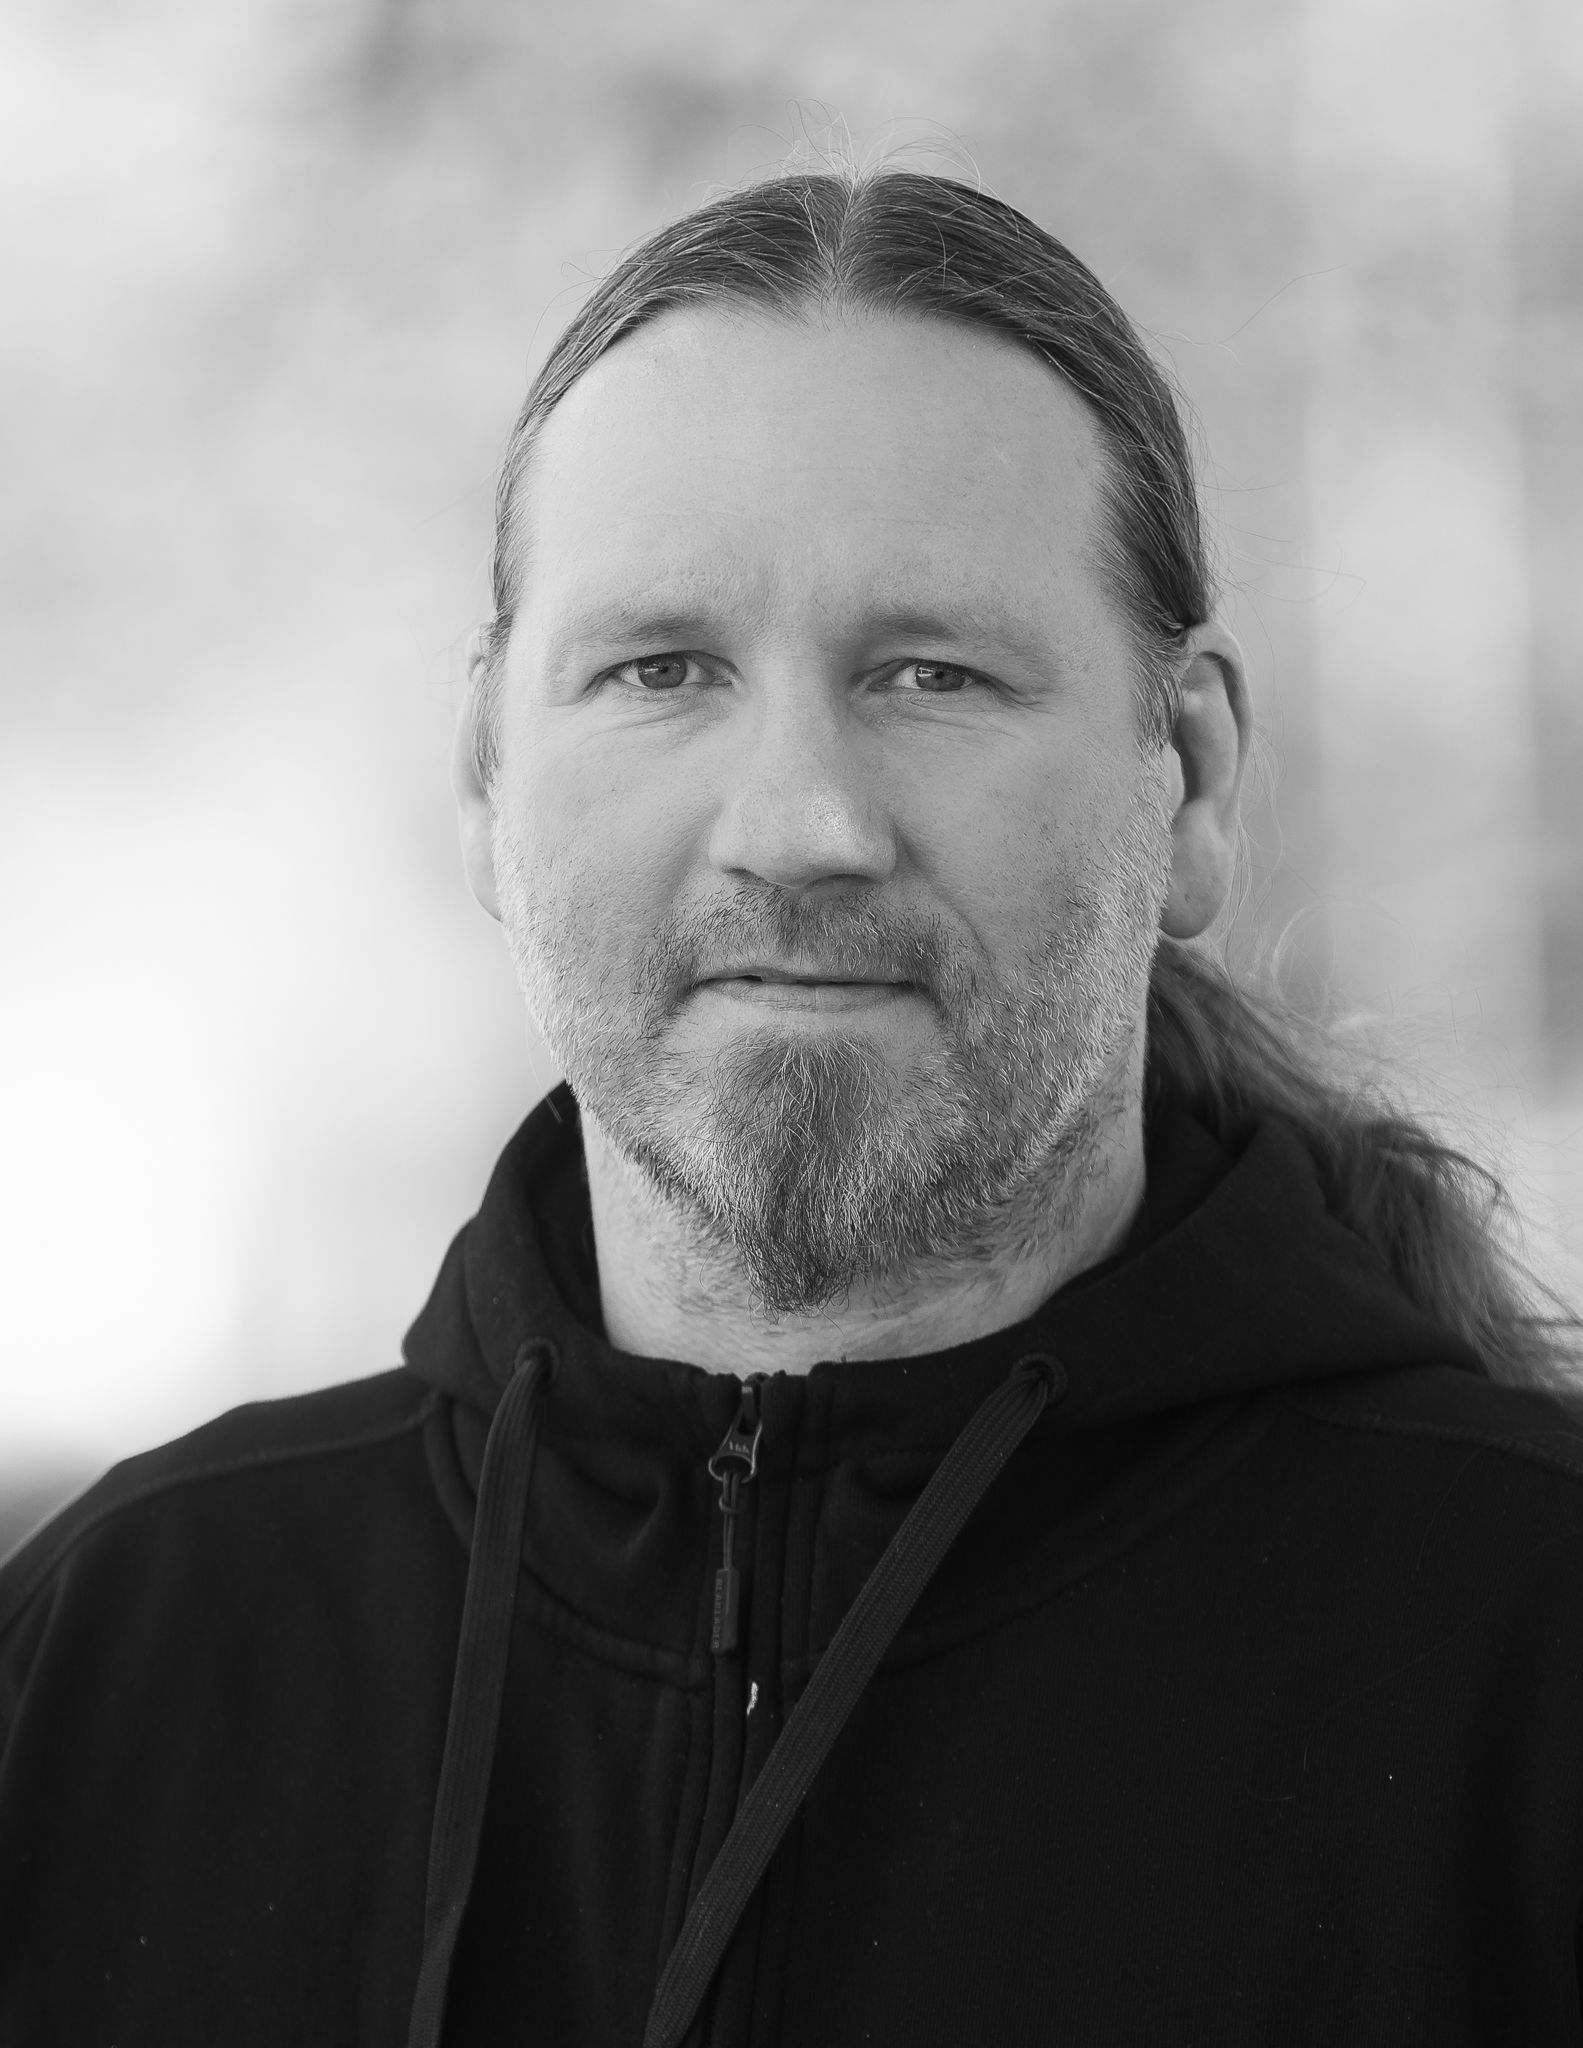 Tryggve Gustafsson